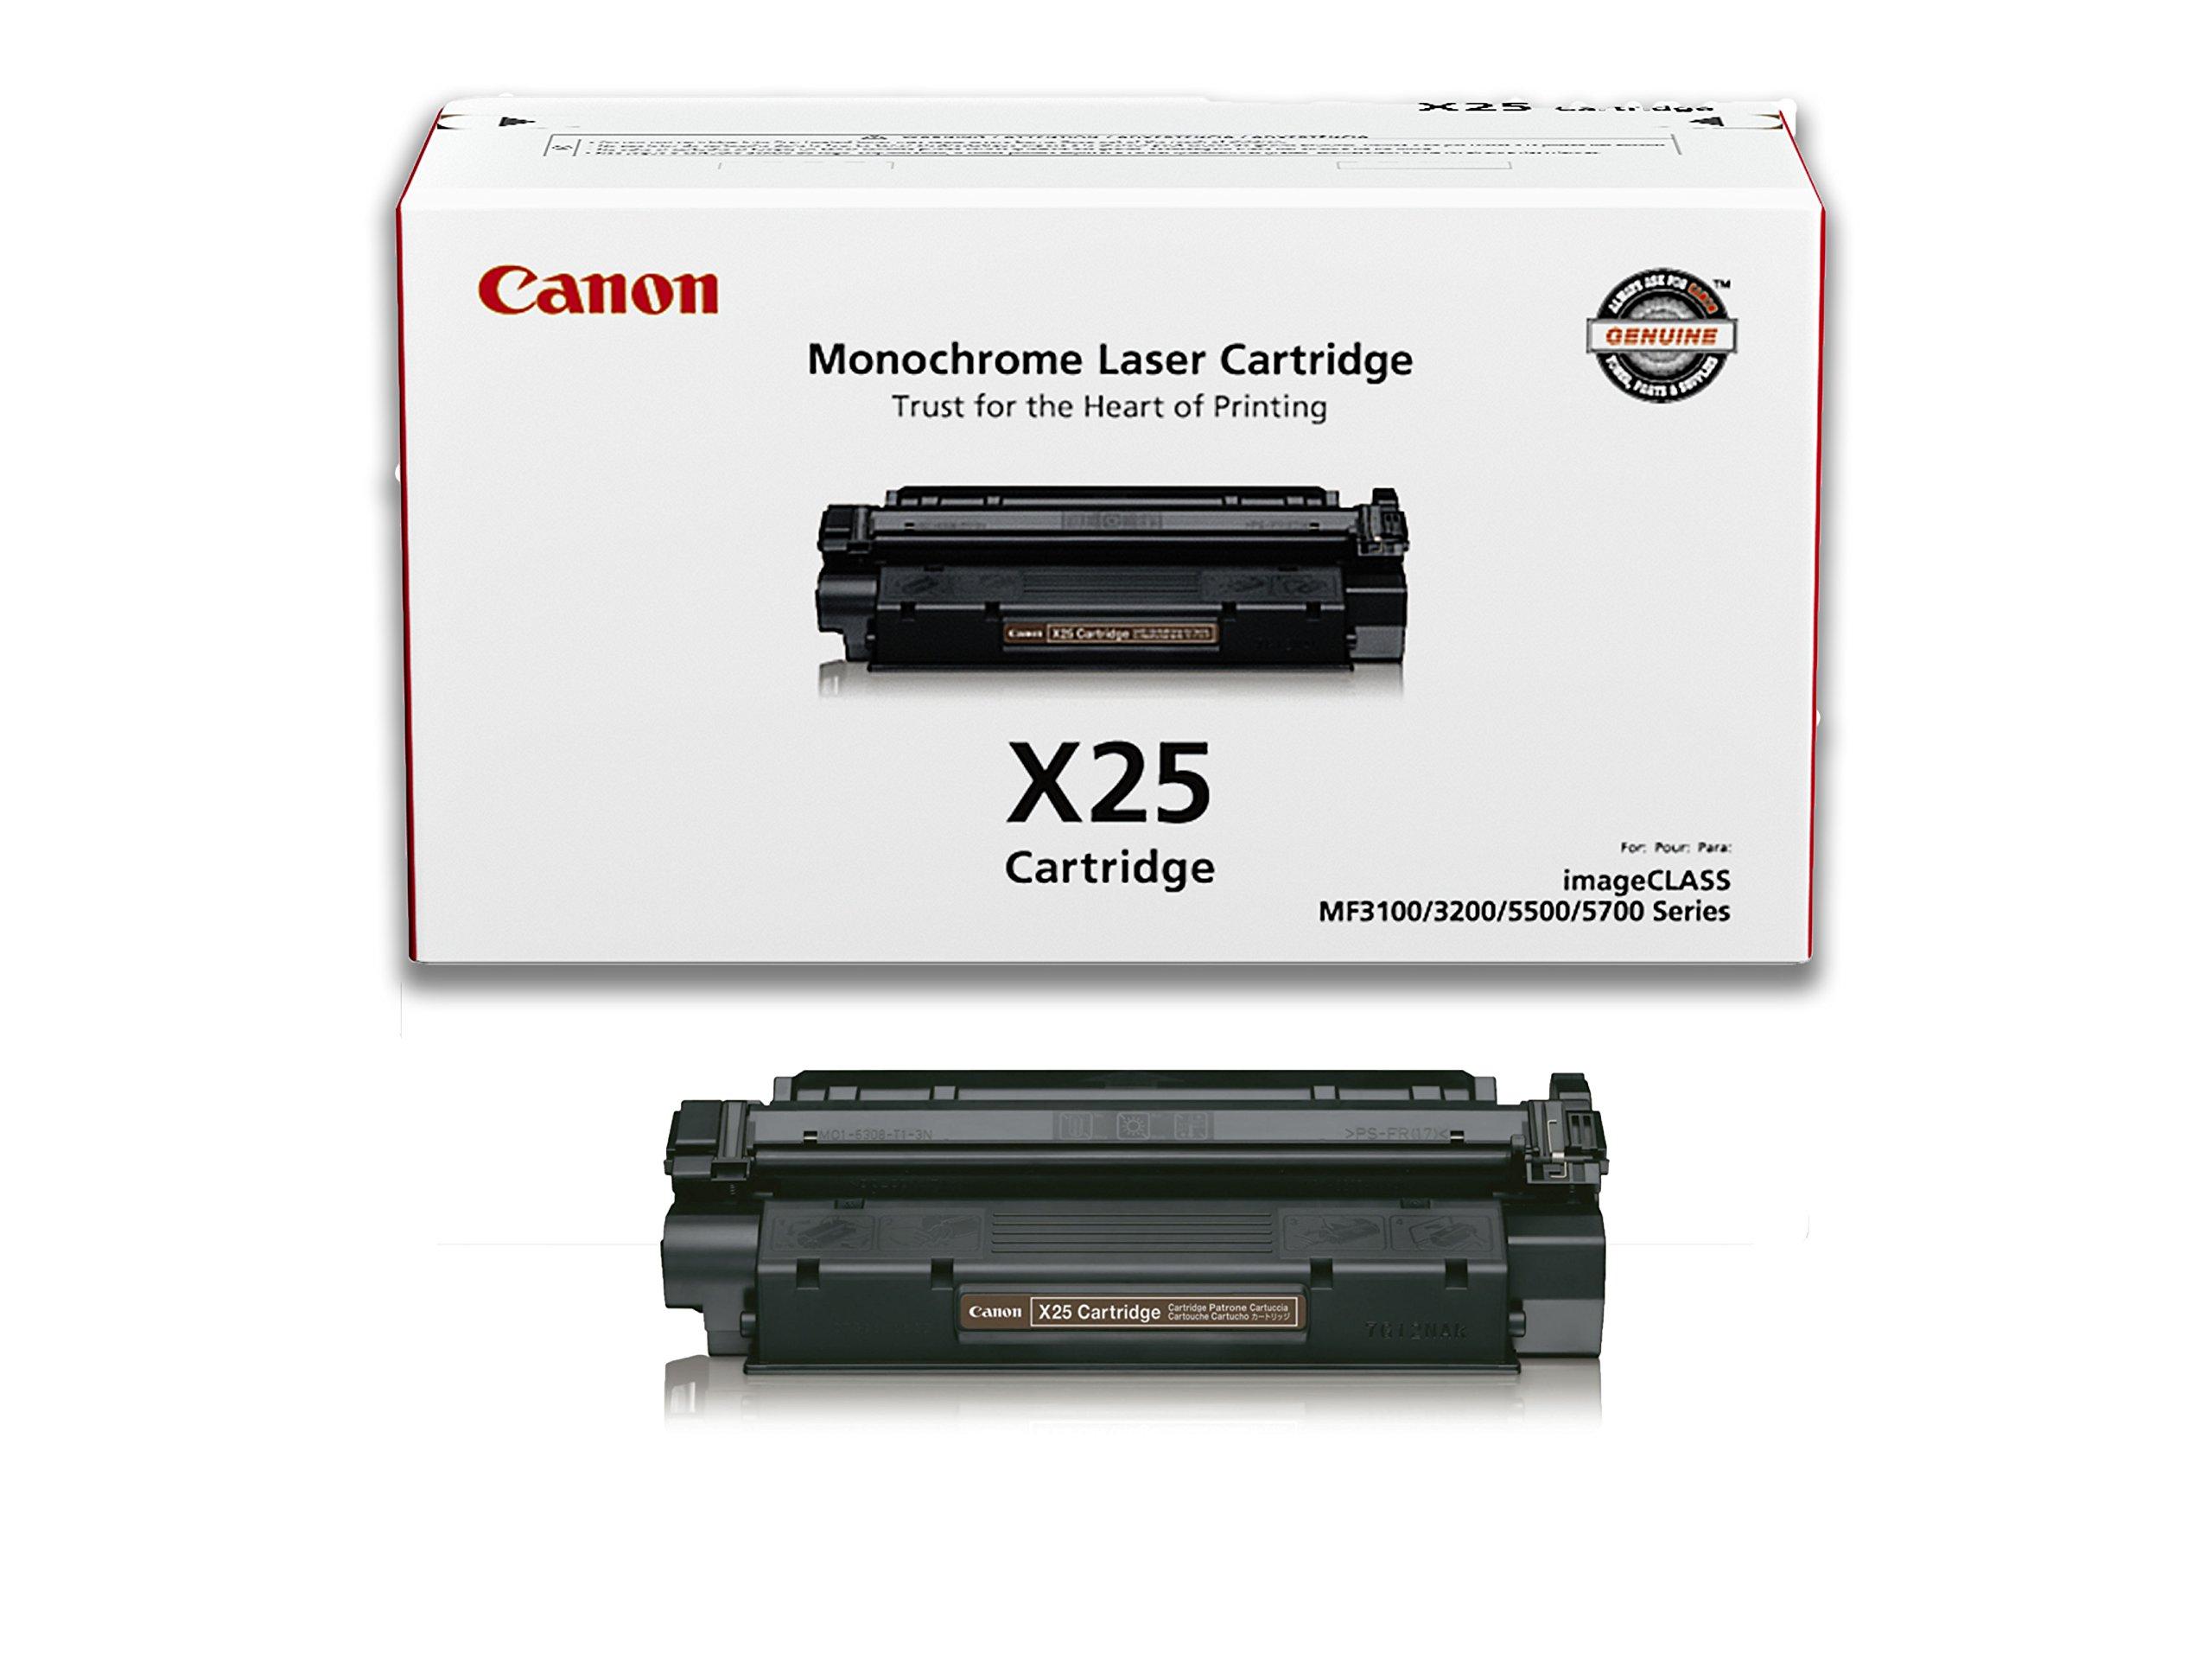 6 Pack Black Compatible F189402 Toner Cartridge Replacement for Canon F189402 Printer Toner Cartridge